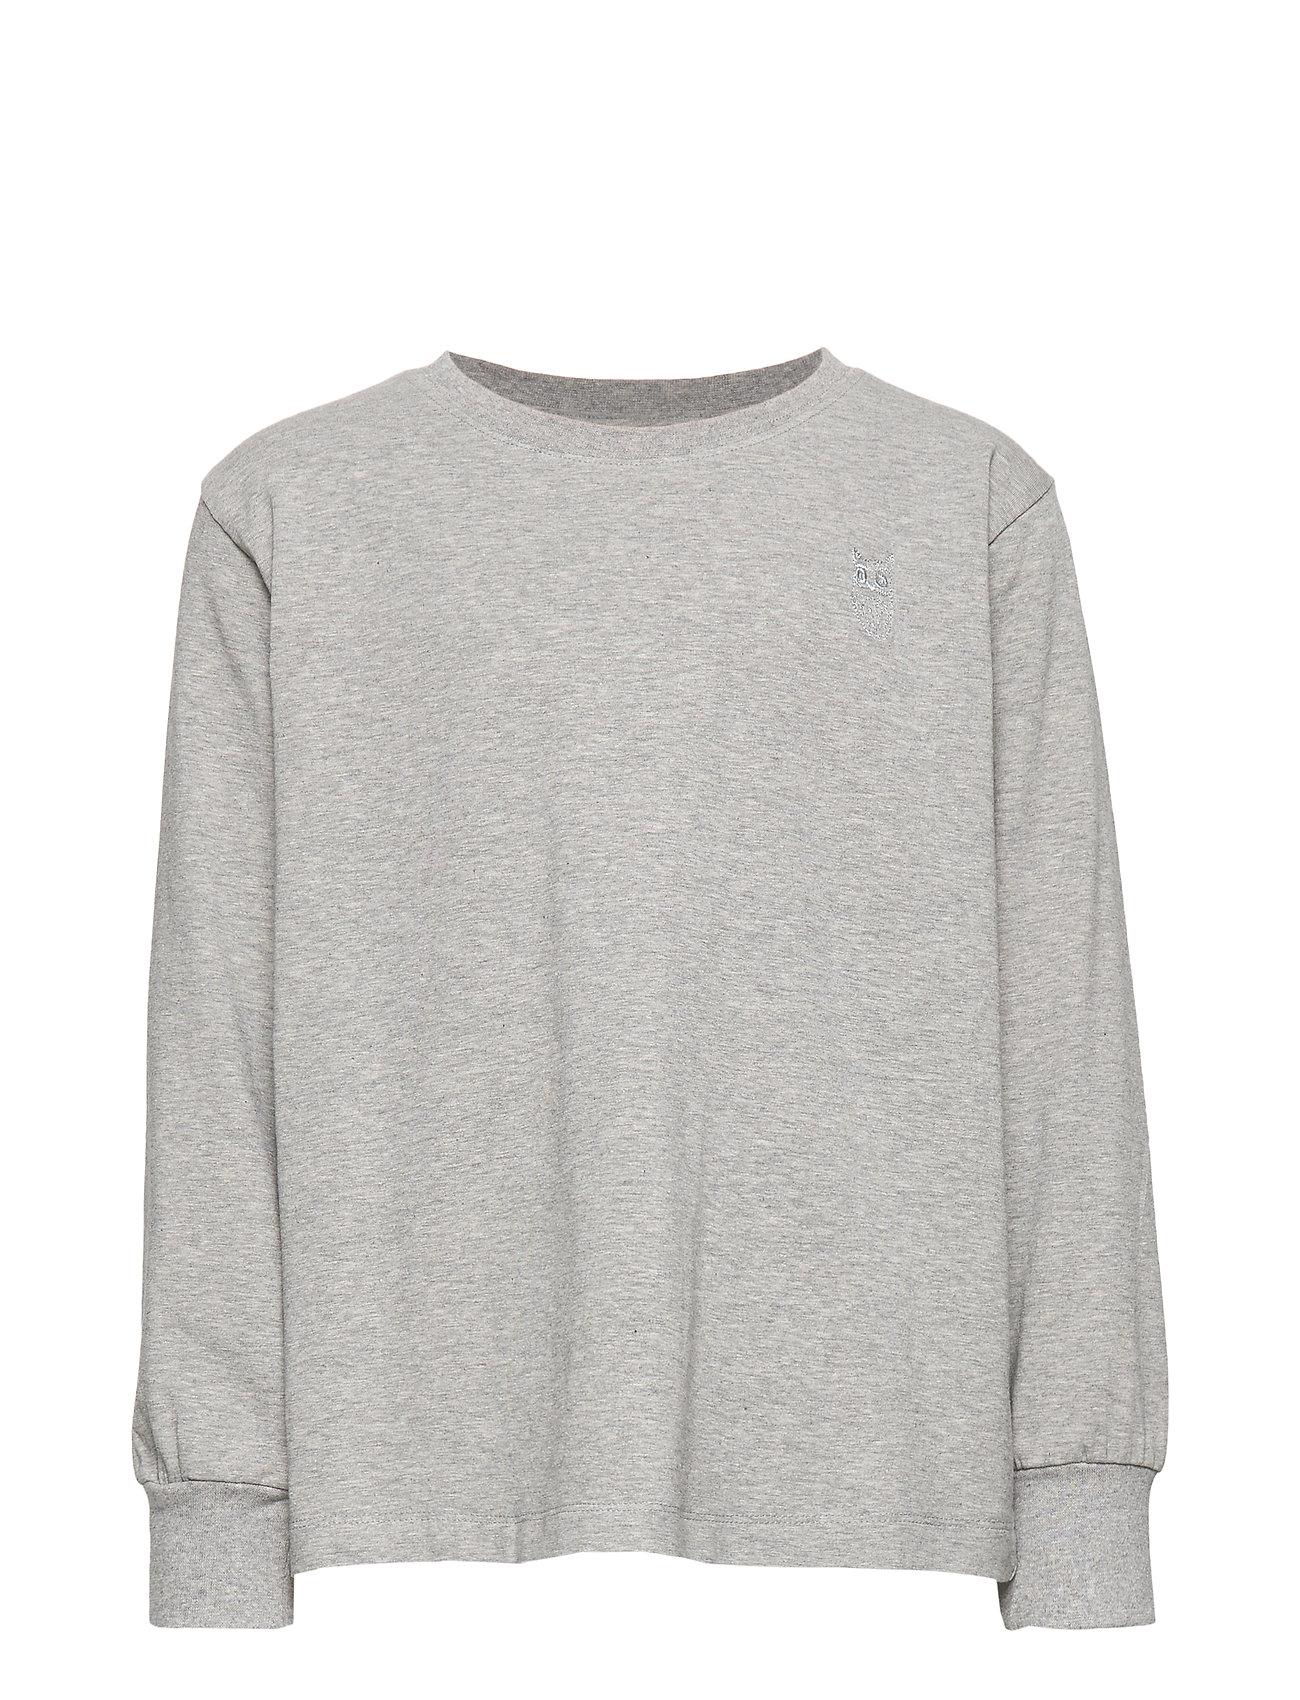 Soft Gallery Benson T-shirt - GREY MELANGE, MINI OWL EMB.